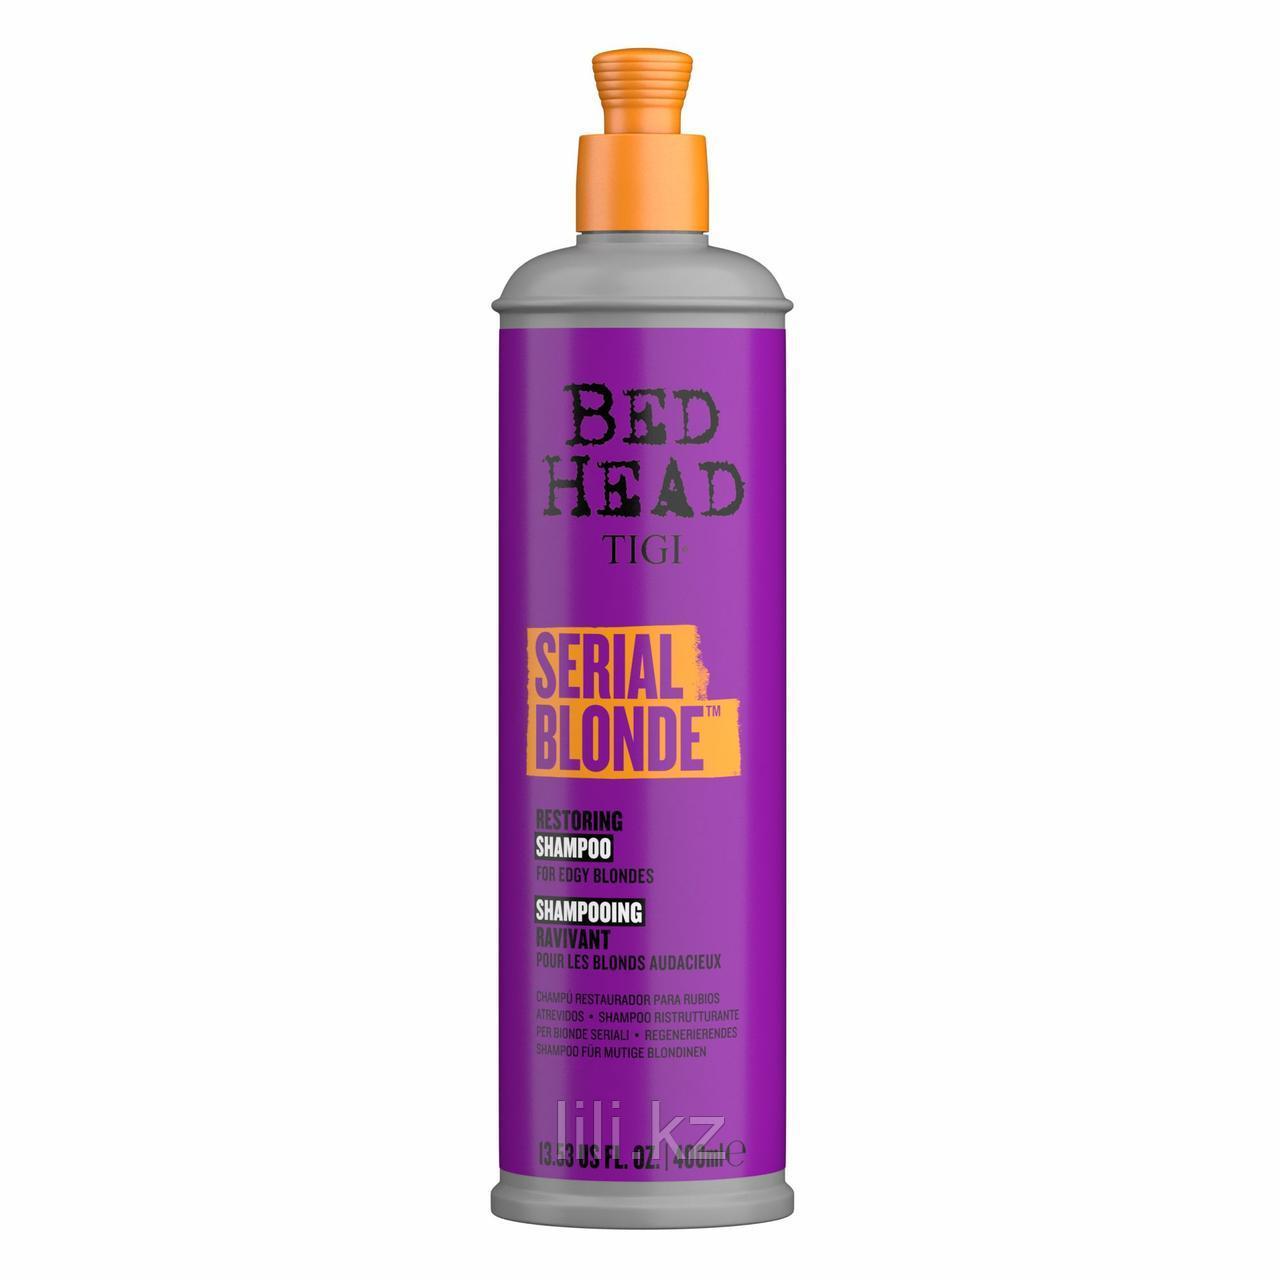 Восстанавливающий шампунь для блондинок - TIGI Bed Head Serial Blonde Shampoo 400 мл.